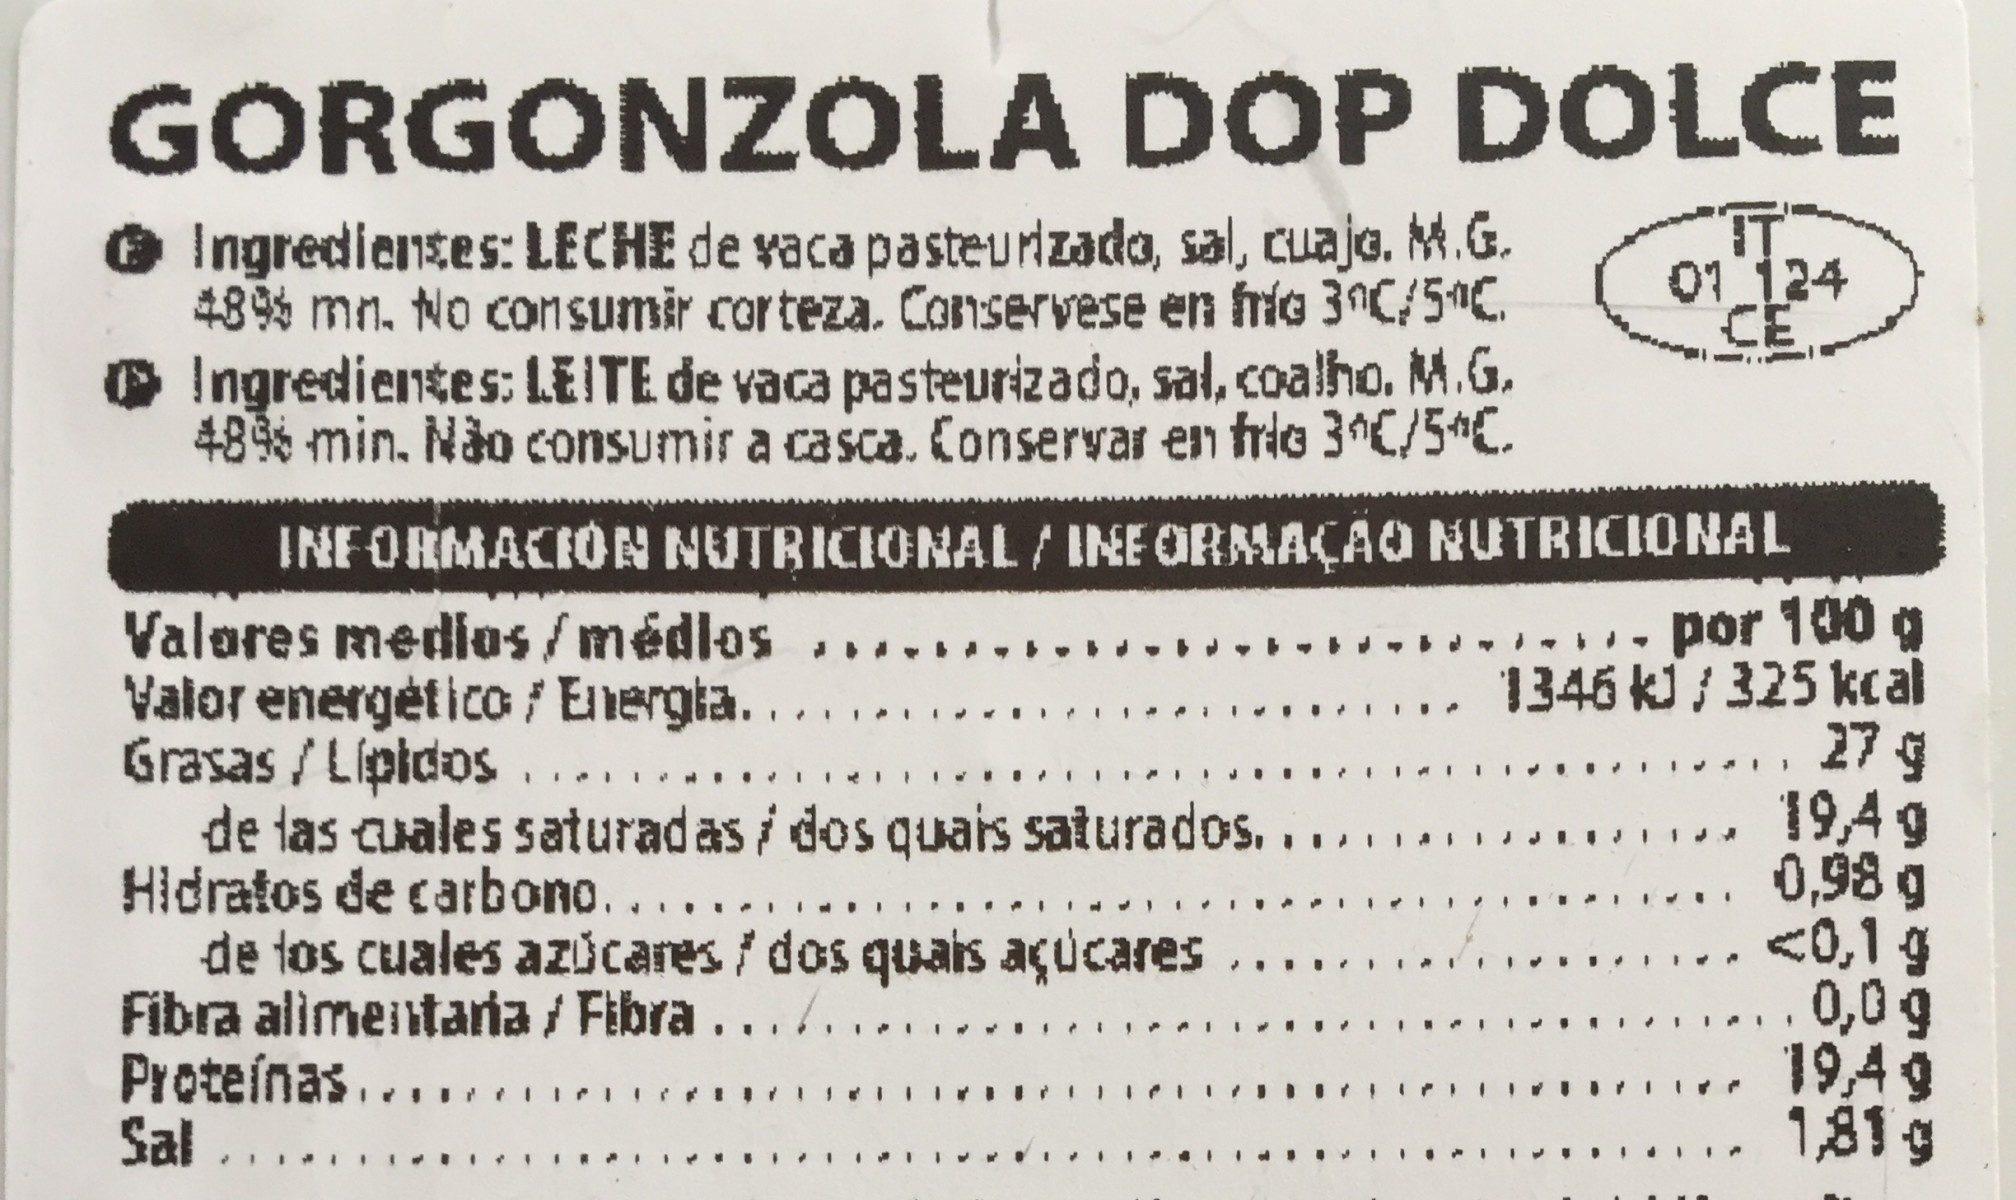 Gorgonzola dolce - Ingredients